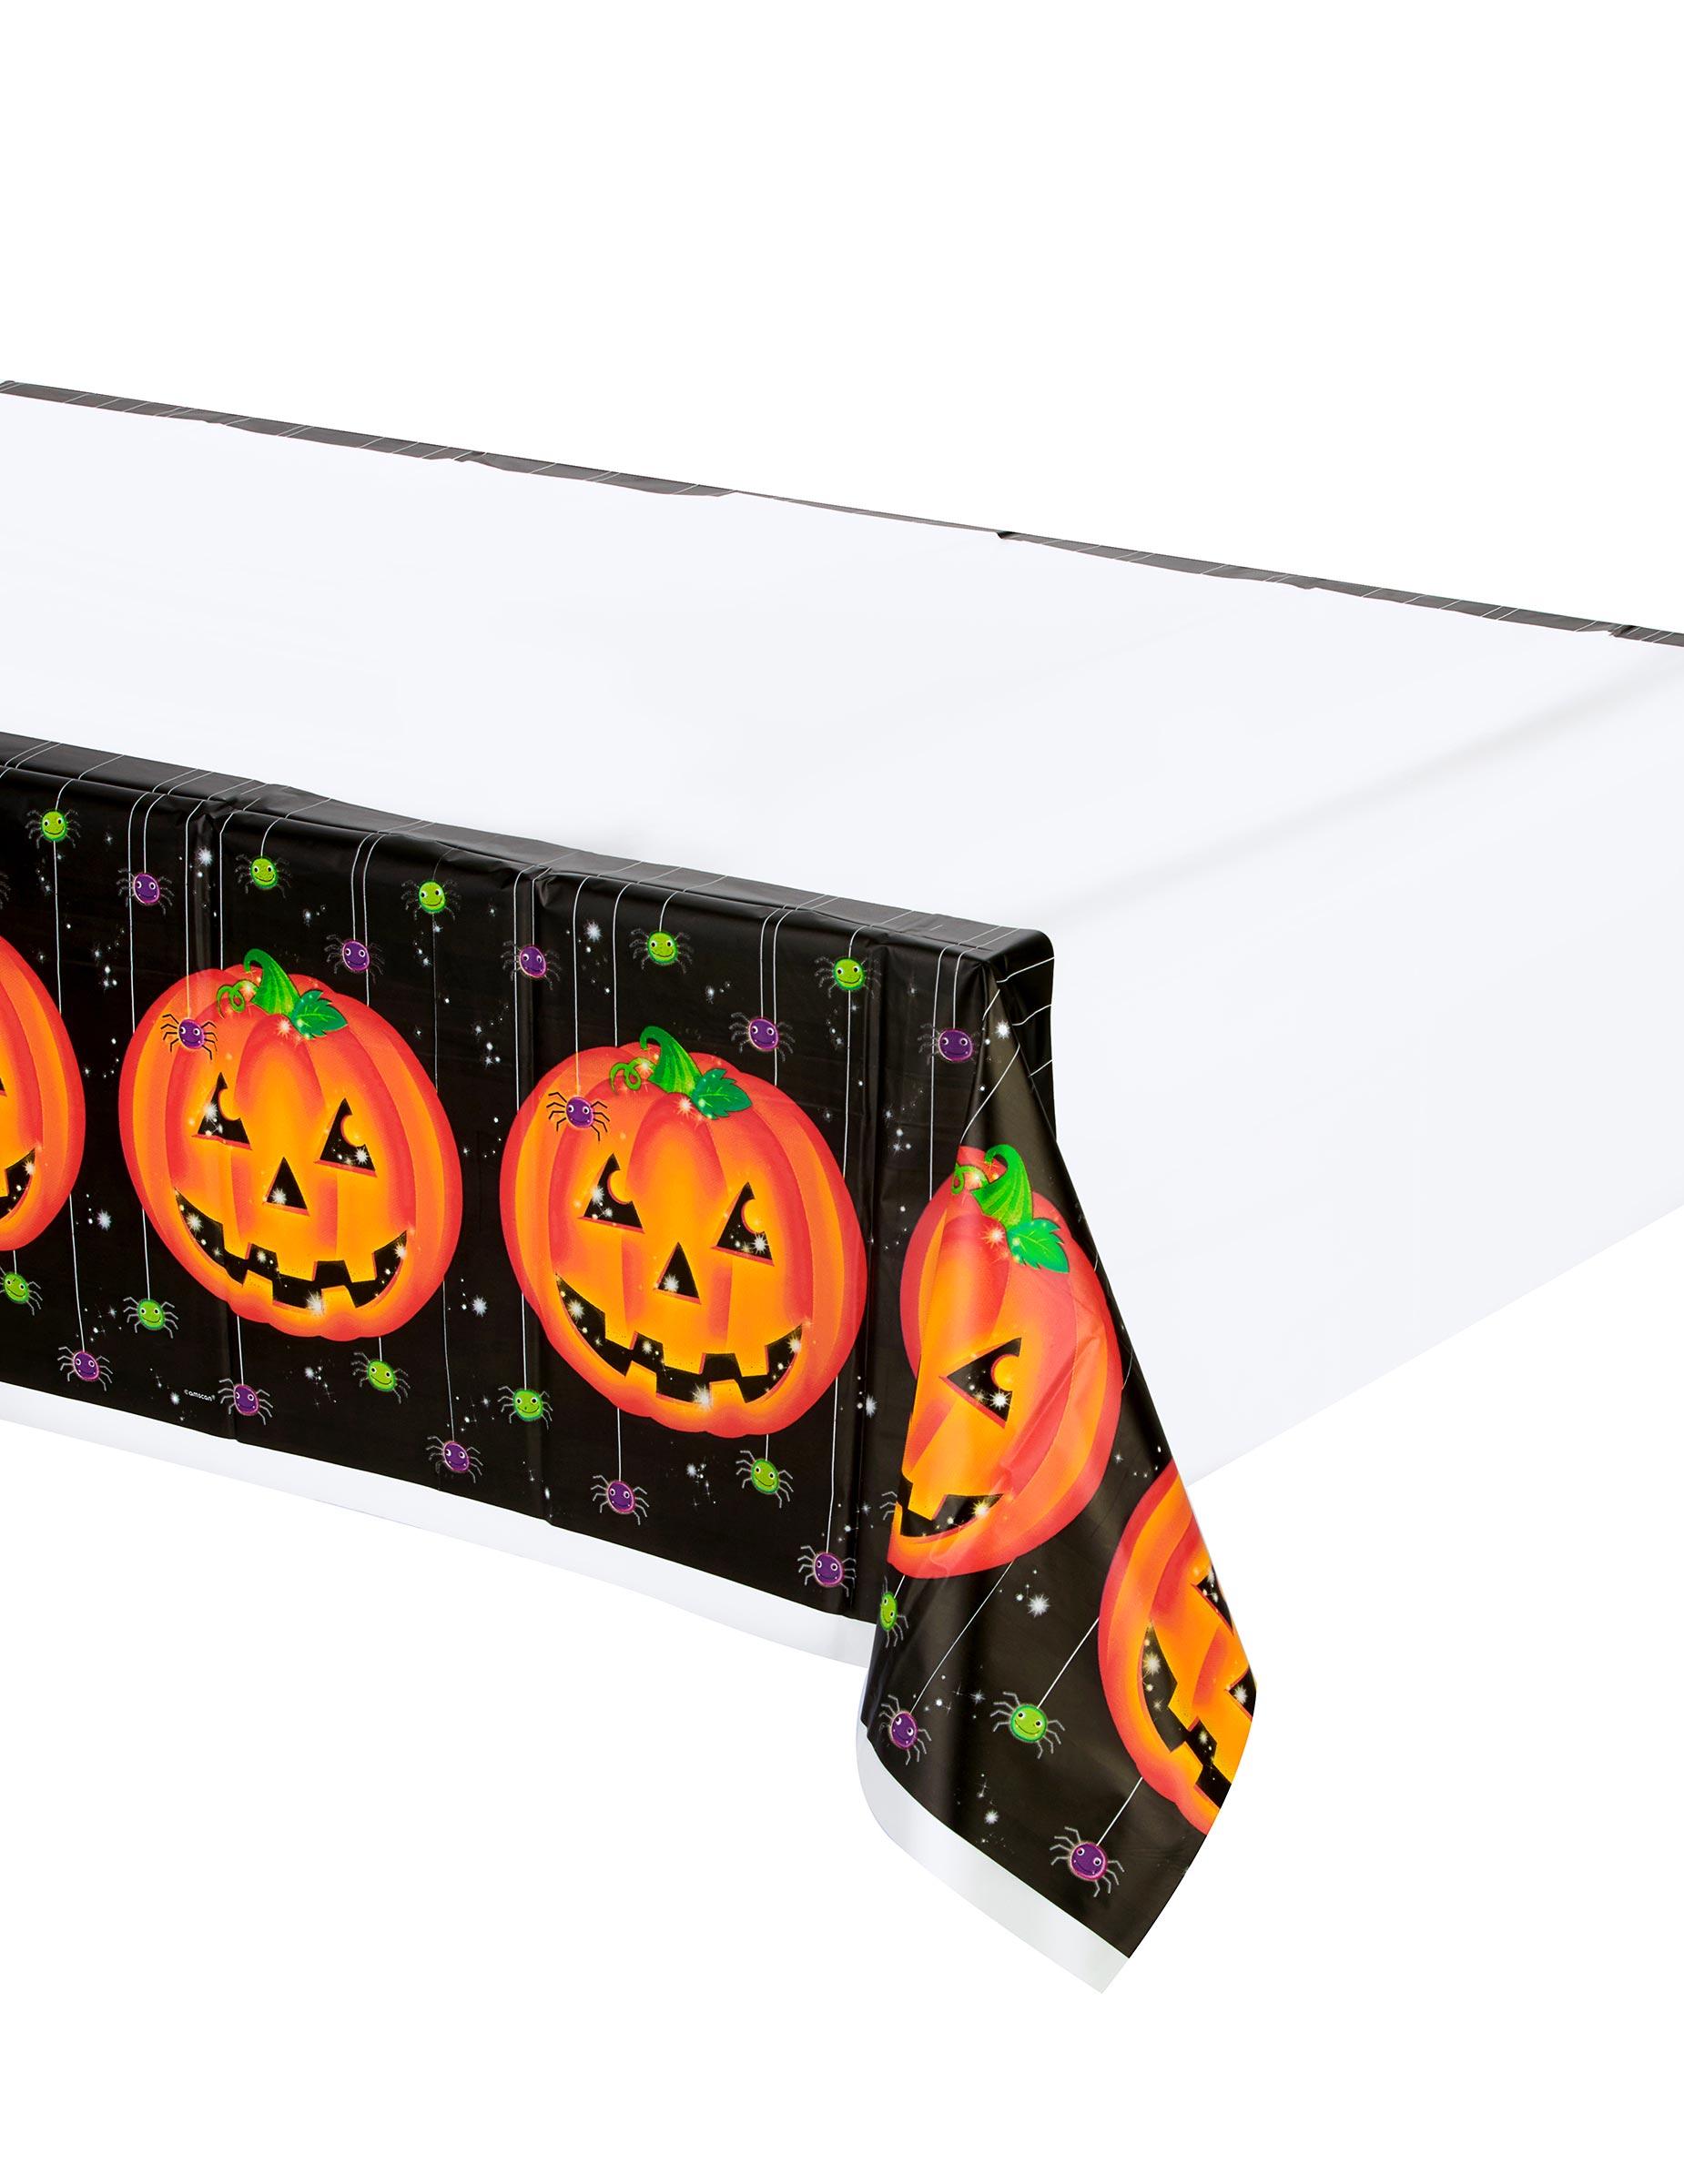 k rbis halloween tischdecke weiss orange schwarz 137x259cm g nstige faschings partydeko. Black Bedroom Furniture Sets. Home Design Ideas